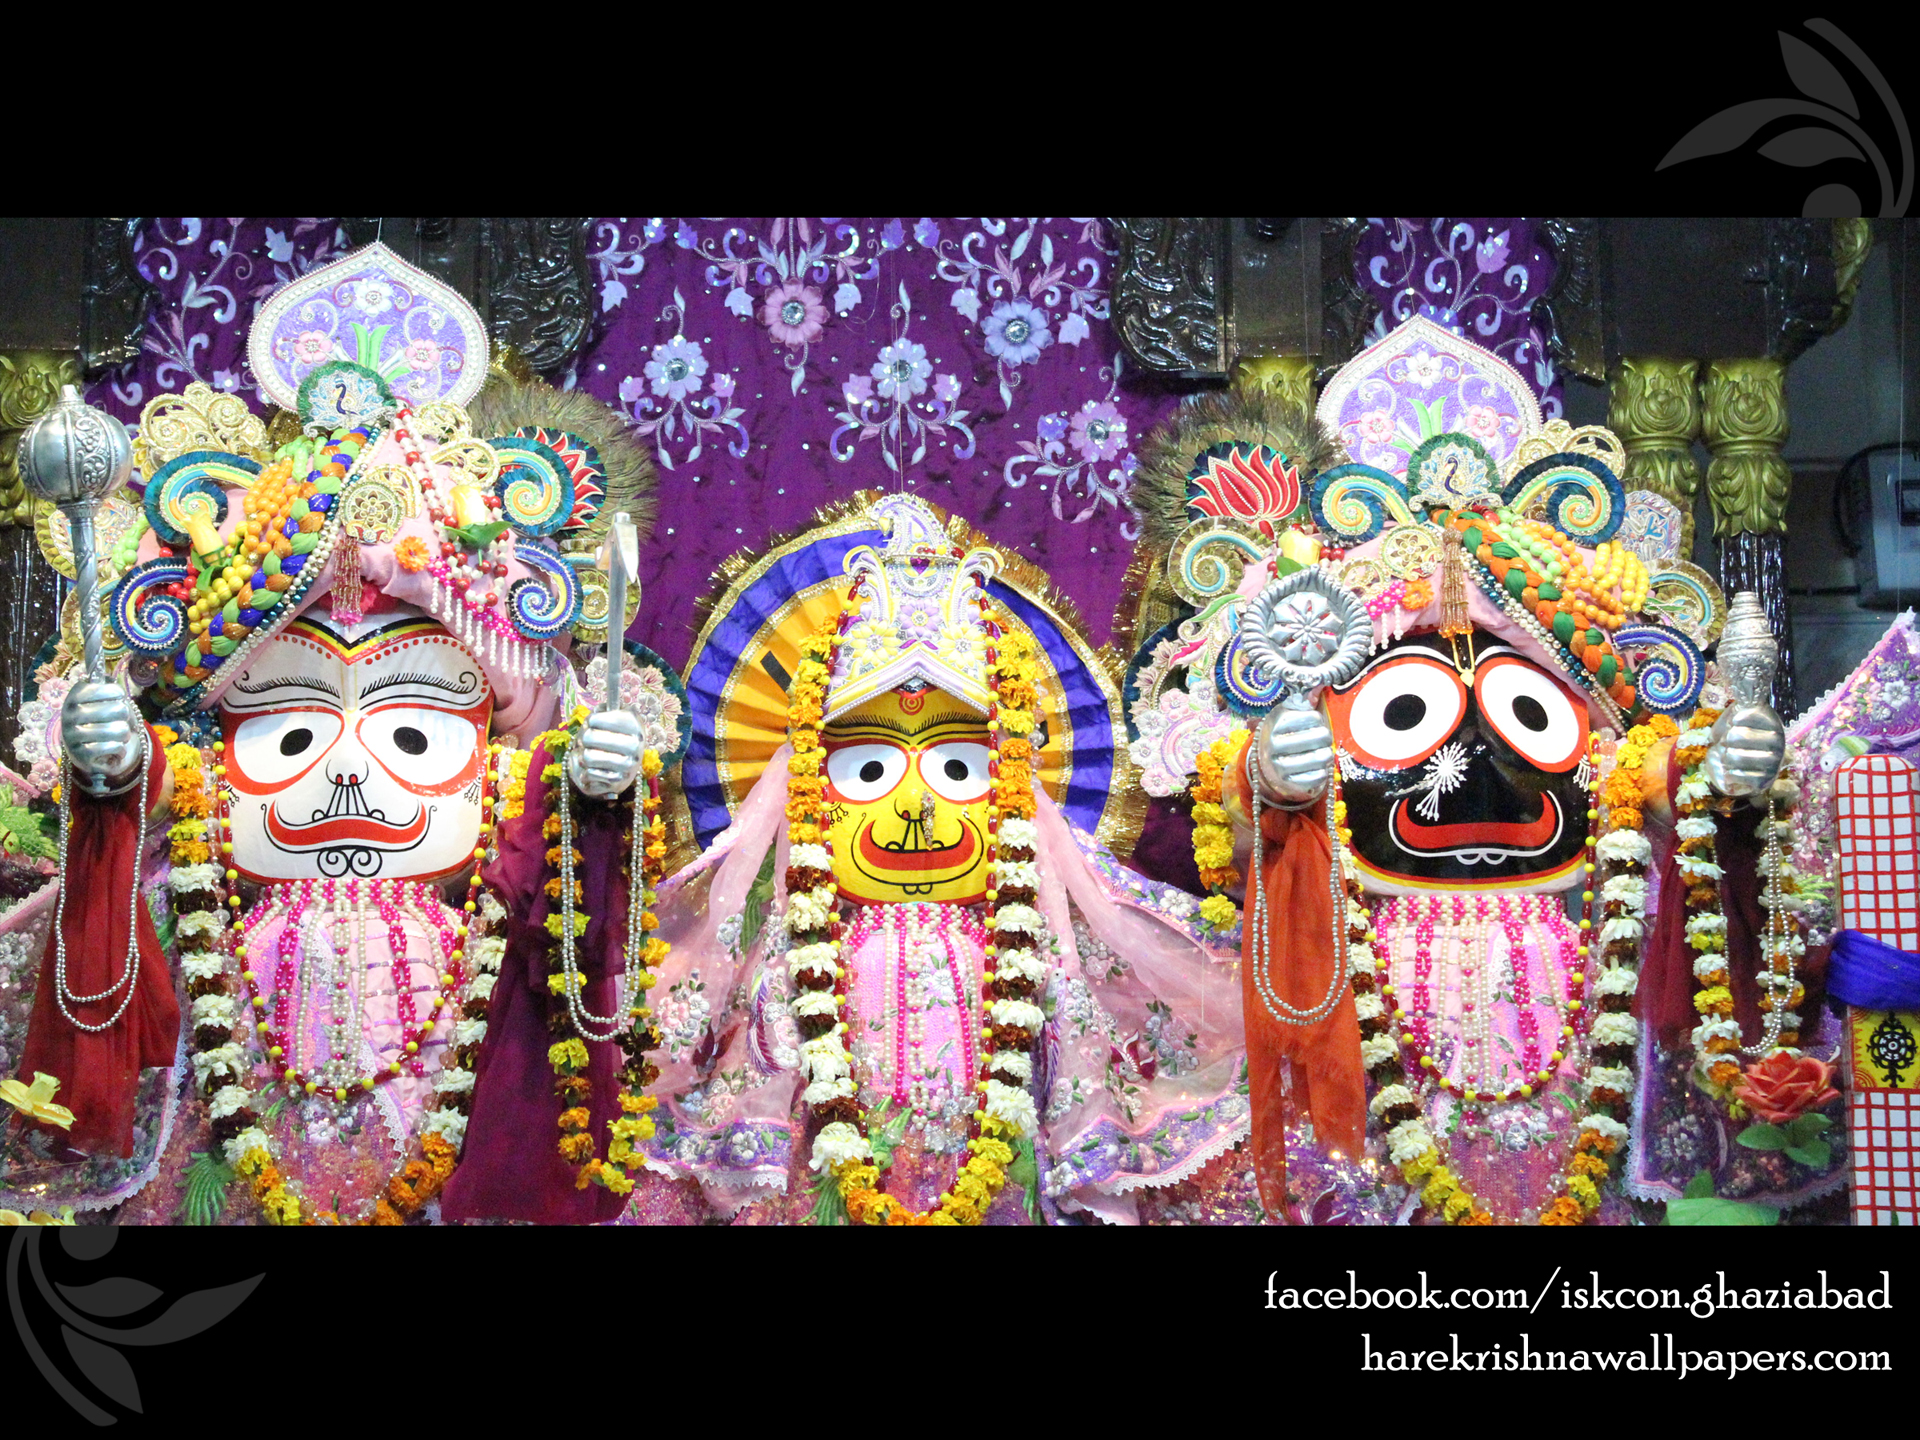 Jagannath Baladeva Subhadra Wallpaper (004) Size 1920x1440 Download